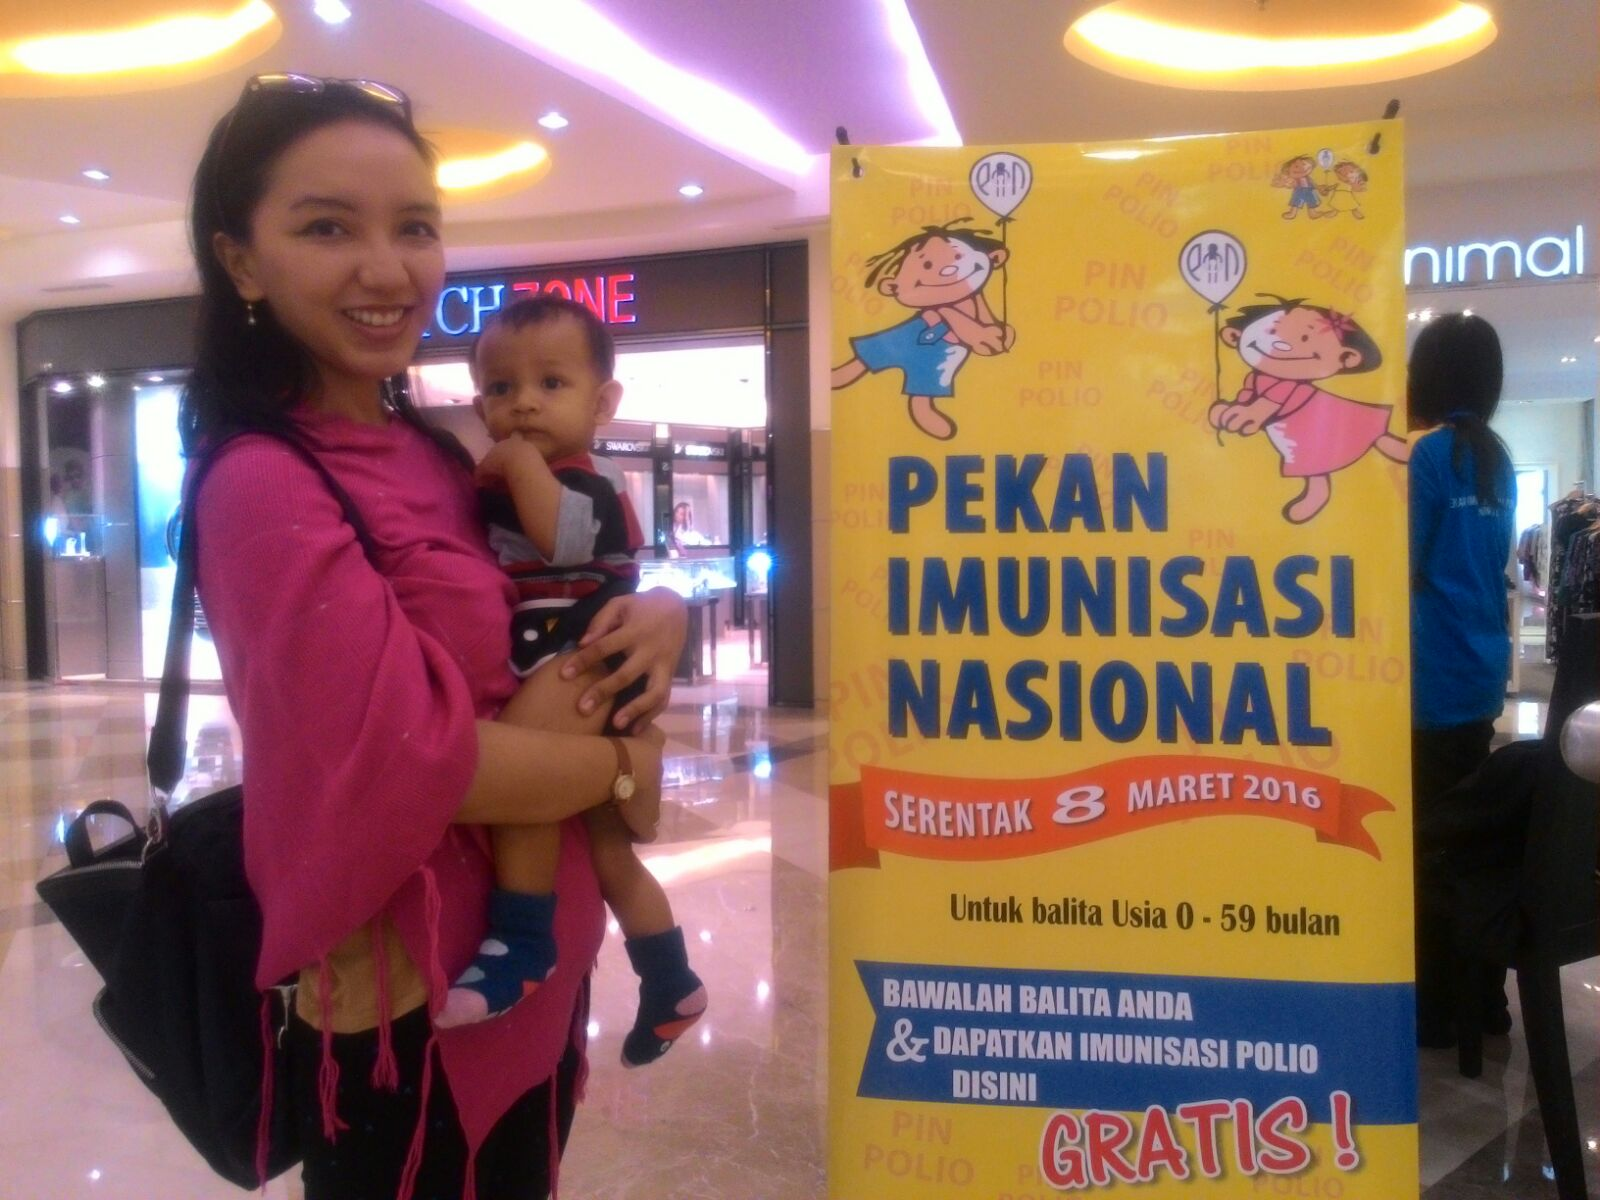 Pekan imunisasi Nasional vaksin polio